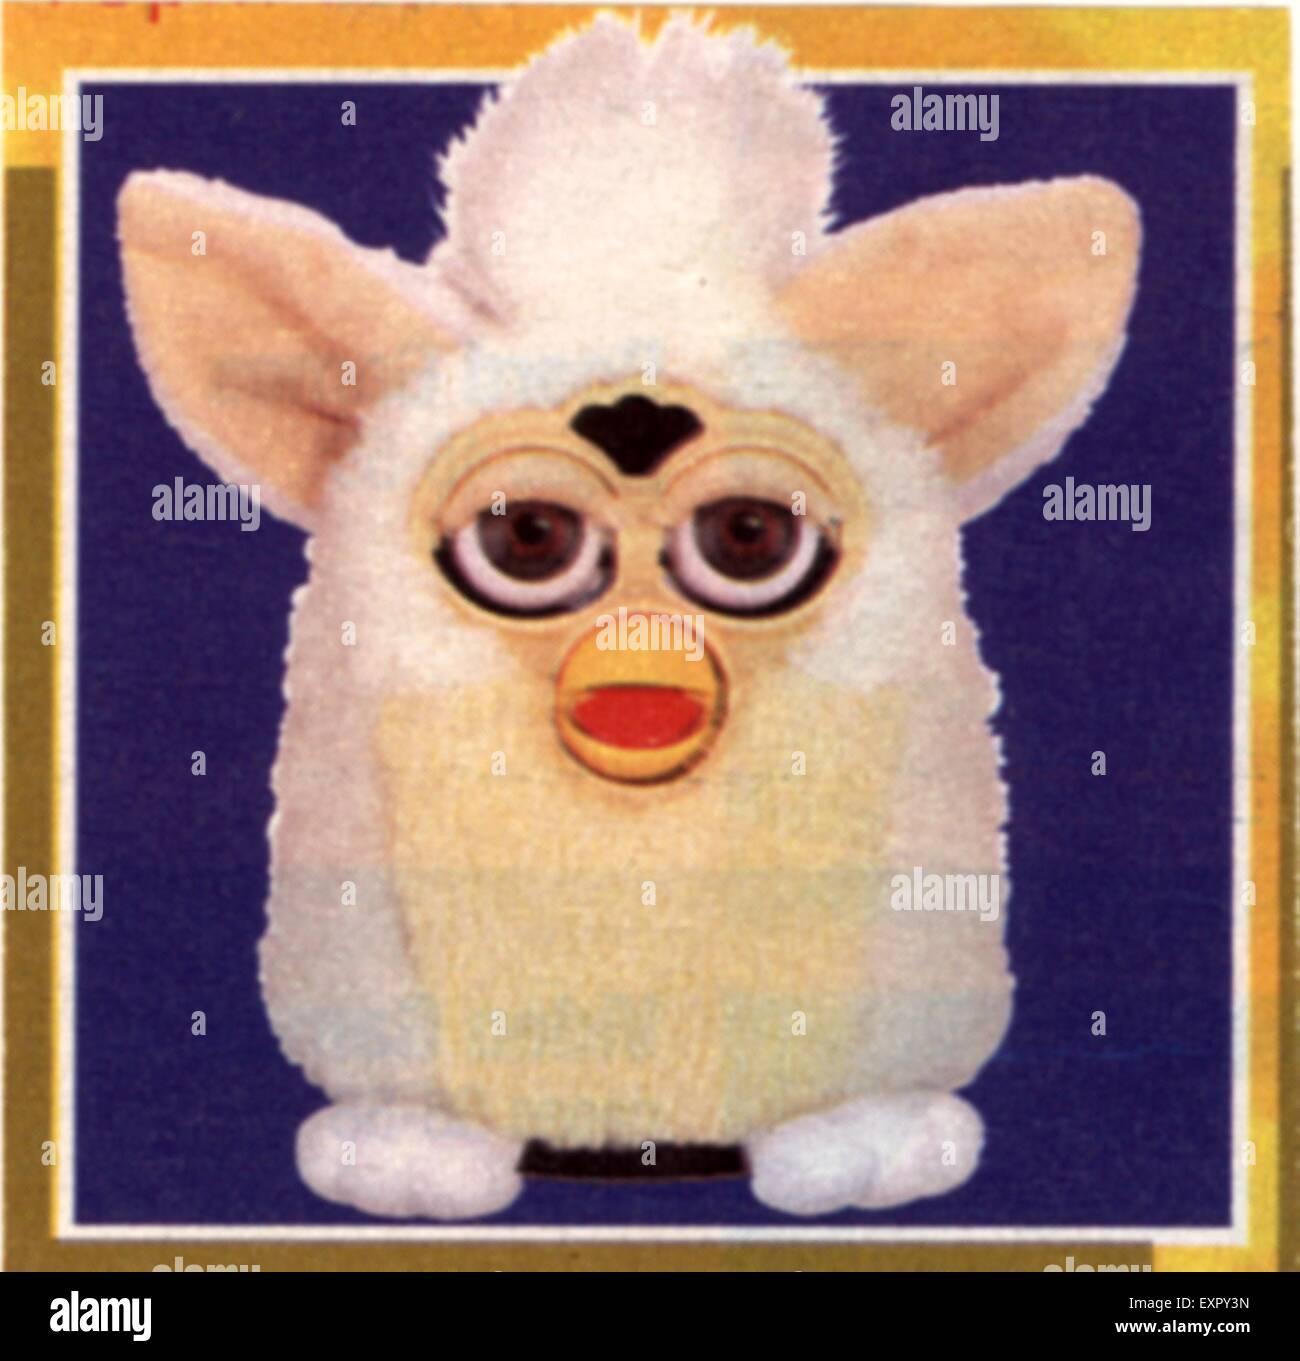 1990s UK Furby Magazine Advert - Stock Image